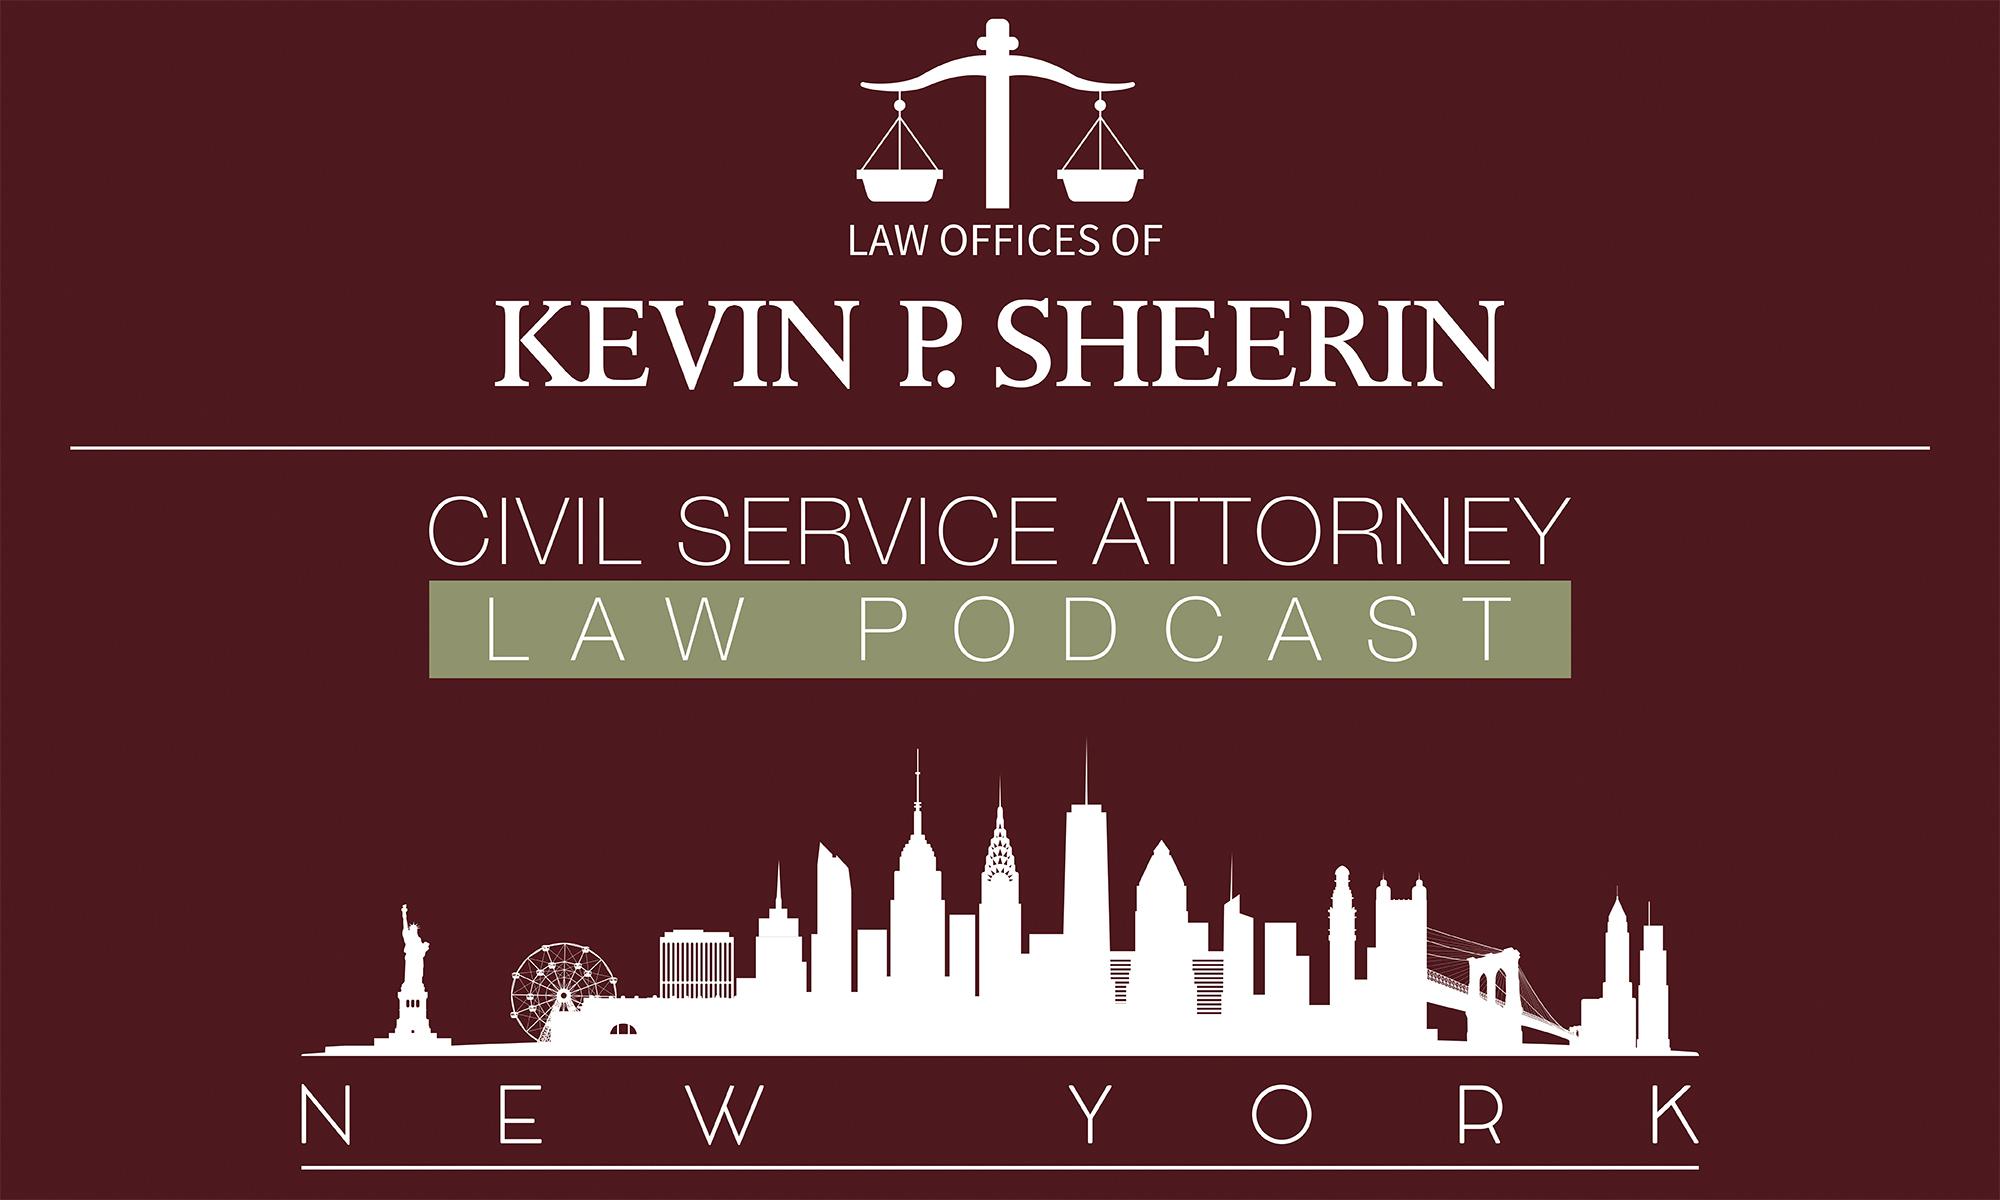 New York Civil Service Attorney Podcast